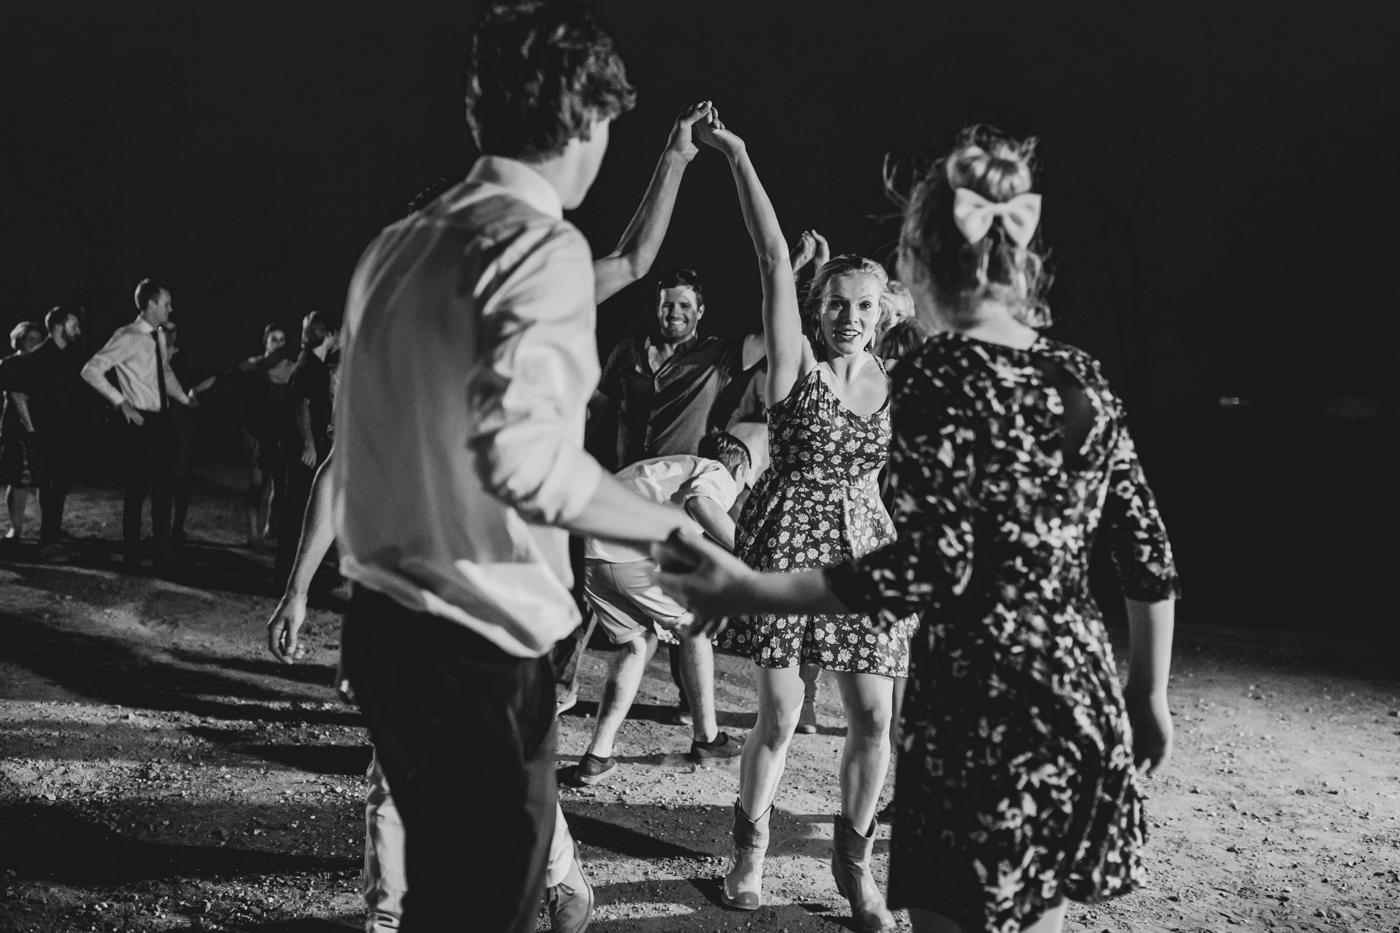 Nicolle & Jacob - Dubbo Wedding - Country Australia - Samantha Heather Photography-306.jpg